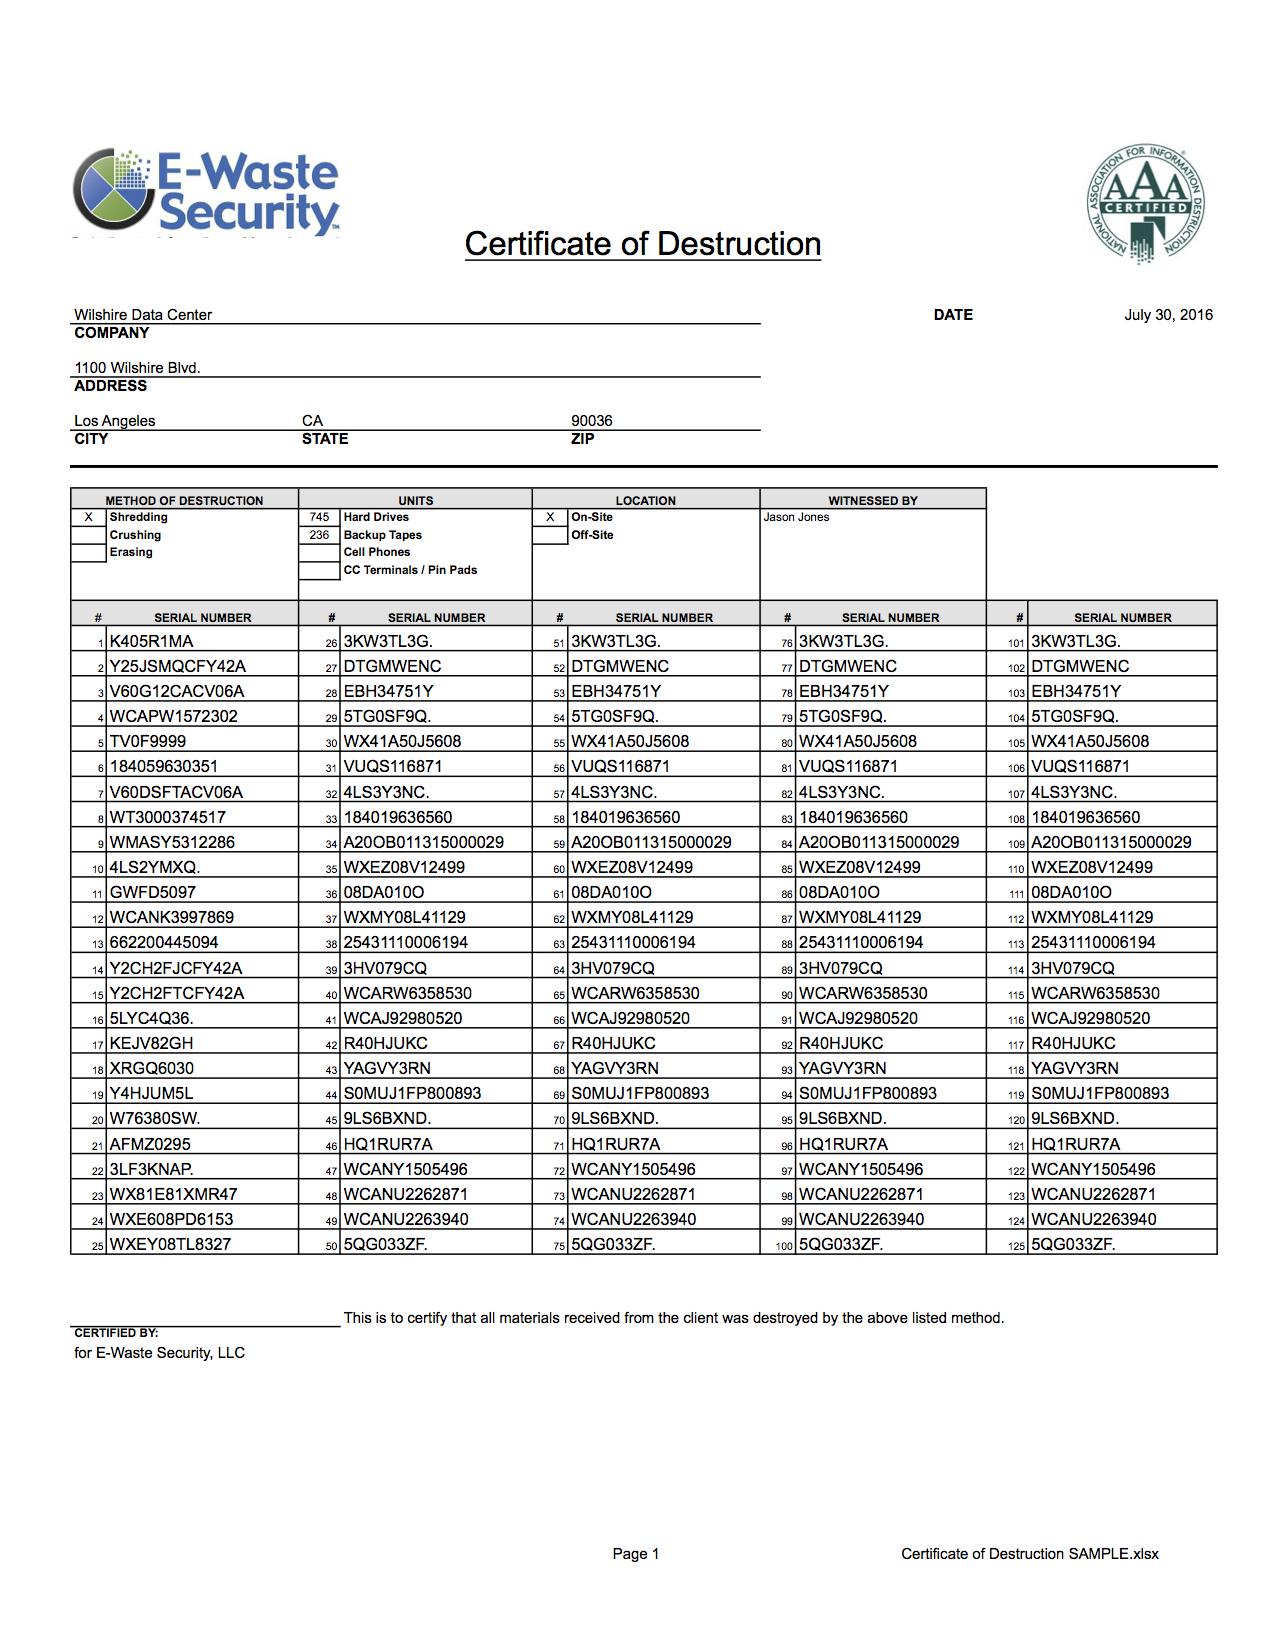 Certificate Of Destruction  Hard Drive Destruction  Ewaste Security Intended For Hard Drive Destruction Certificate Template